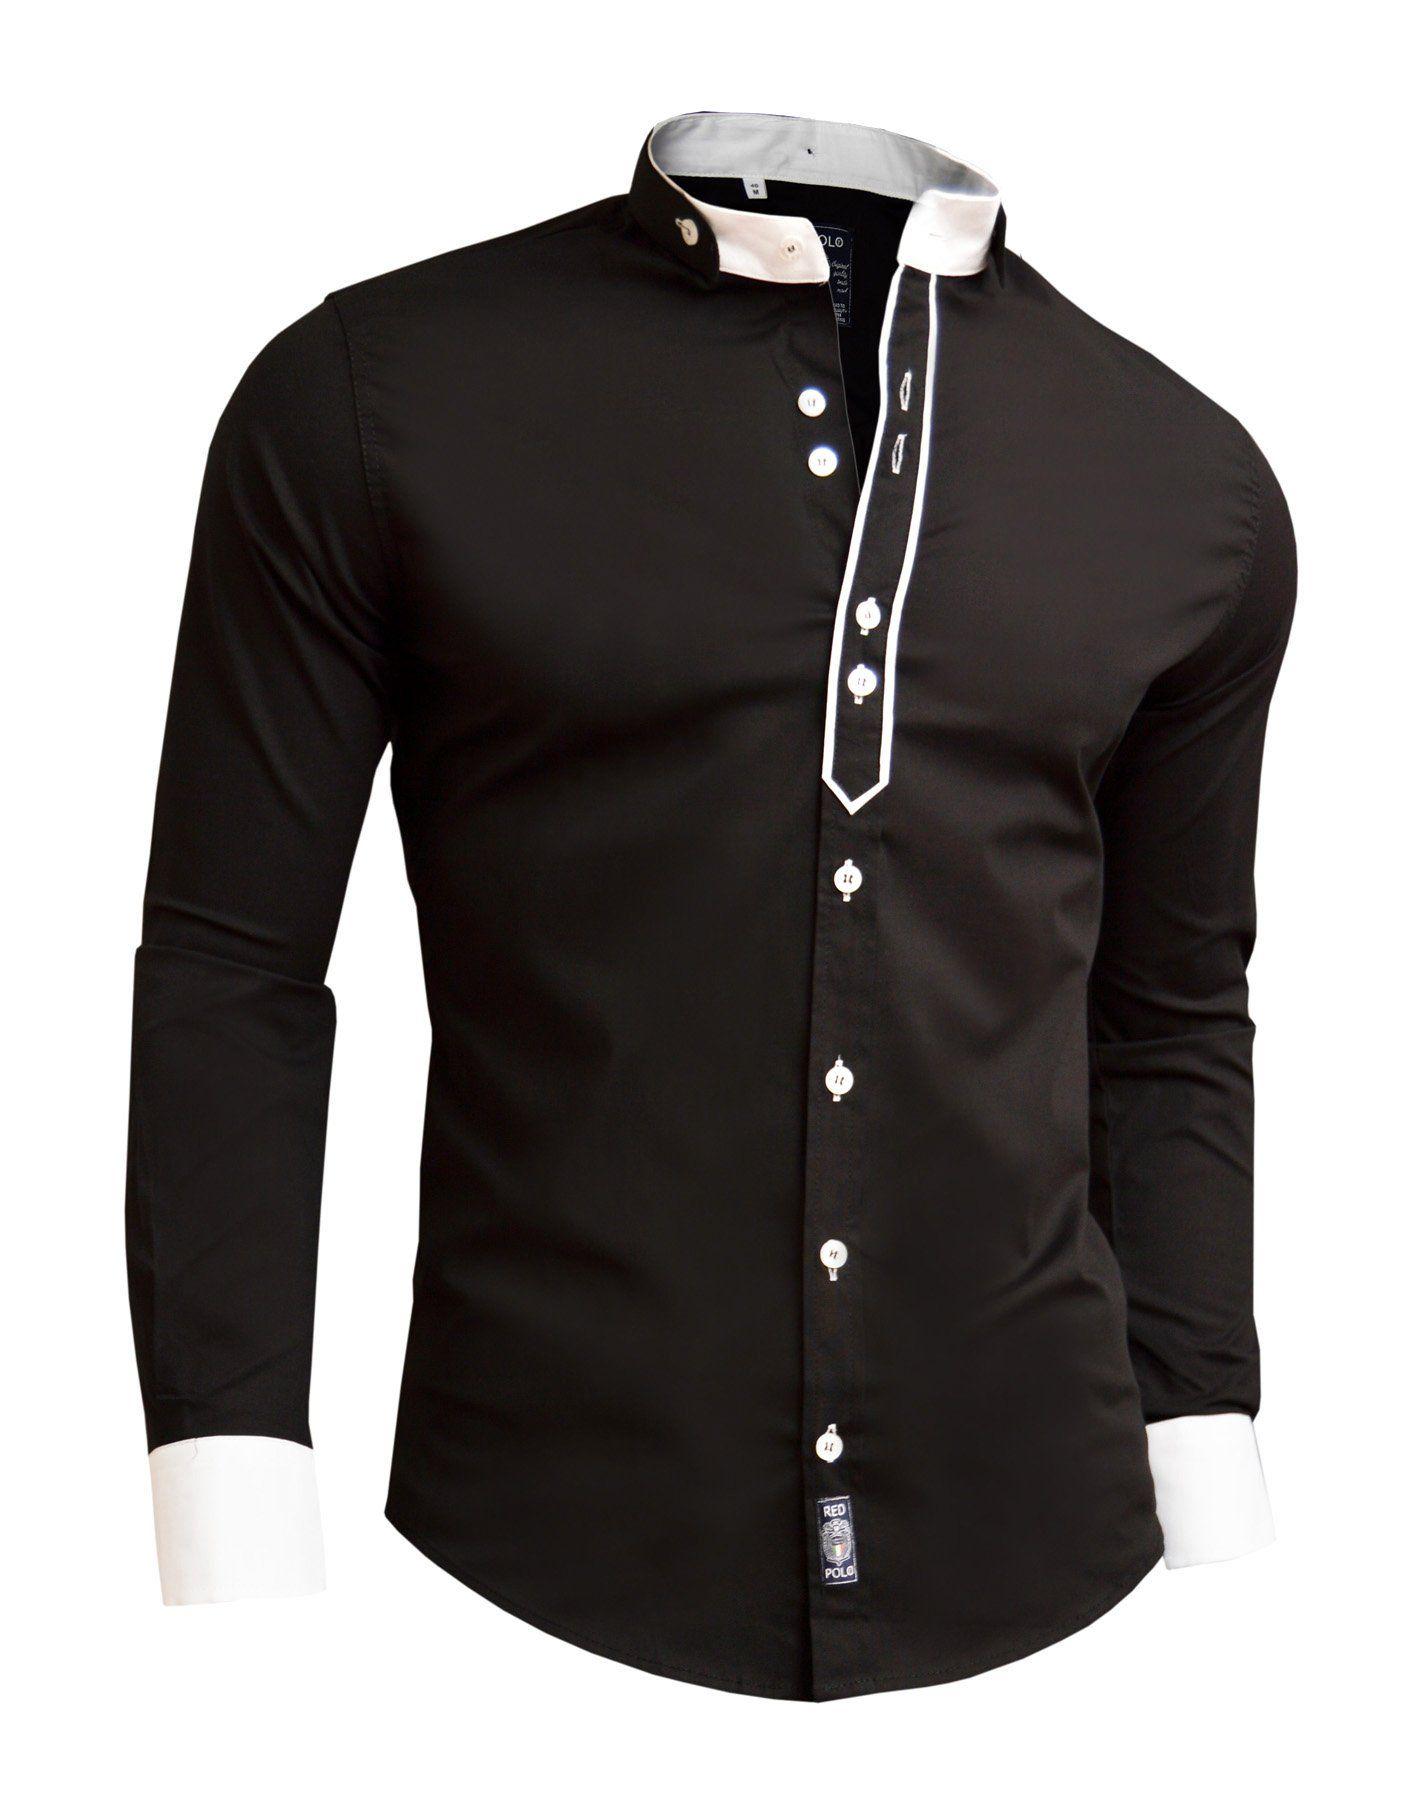 Shirt design with collar - Designer Men Casual Formal Double Cuffs Grandad Band Collar Shirt Elegant Tie Dr Amazon